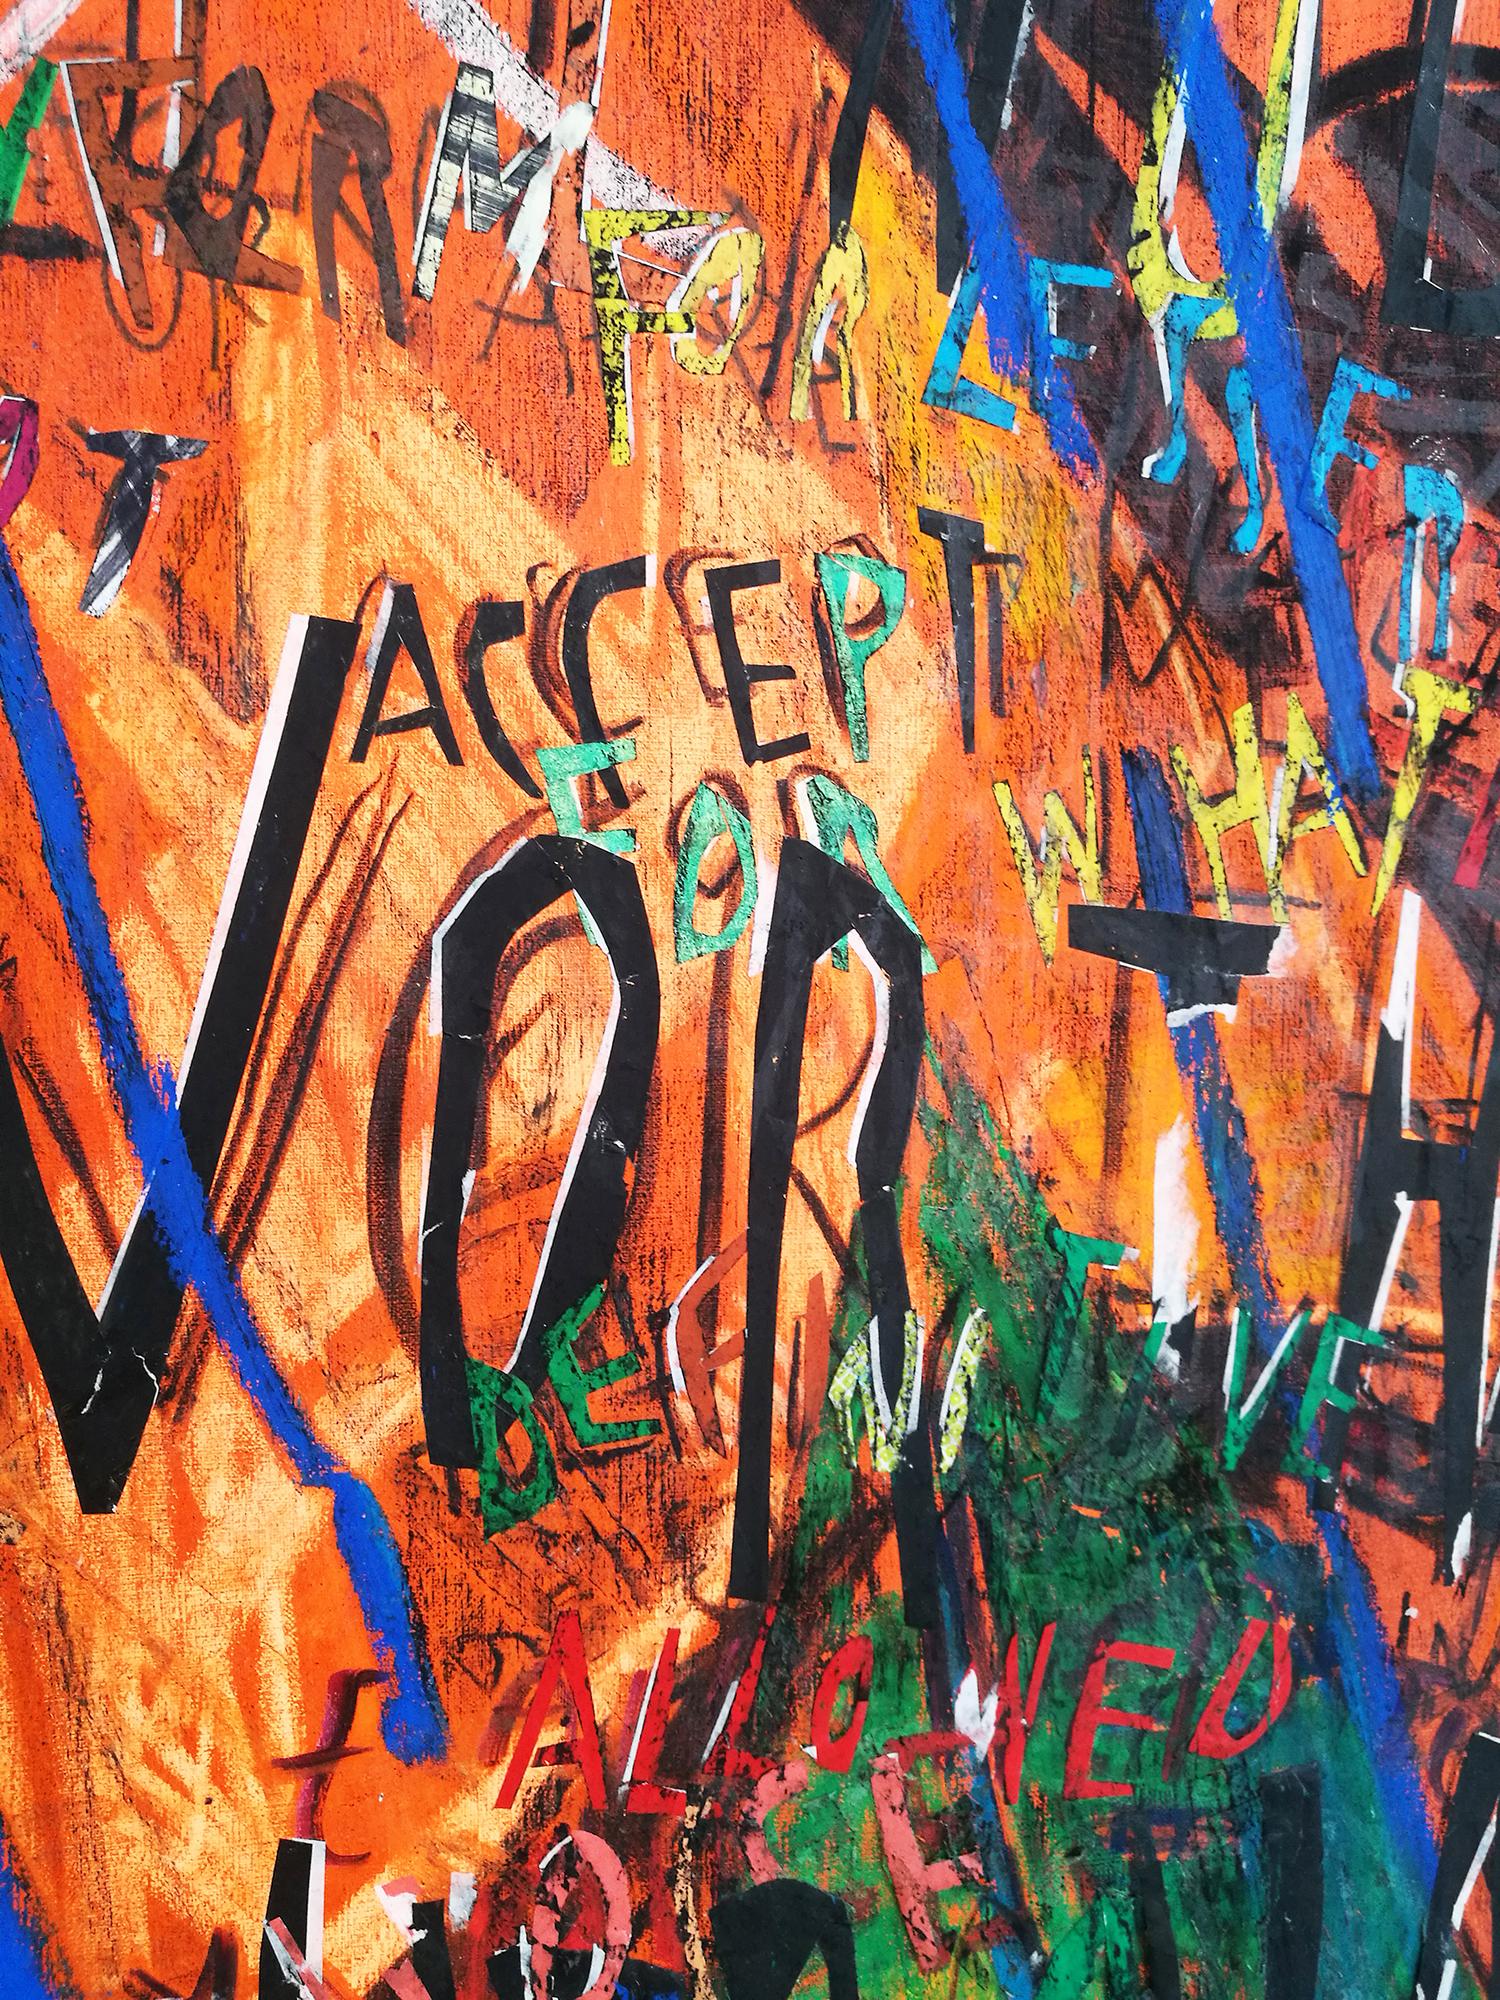 Despina Stokou_RGB affirmations (orange)_Oil and mixed media collage on canvas_123 x 91cm _2018_detailshot2.jpg